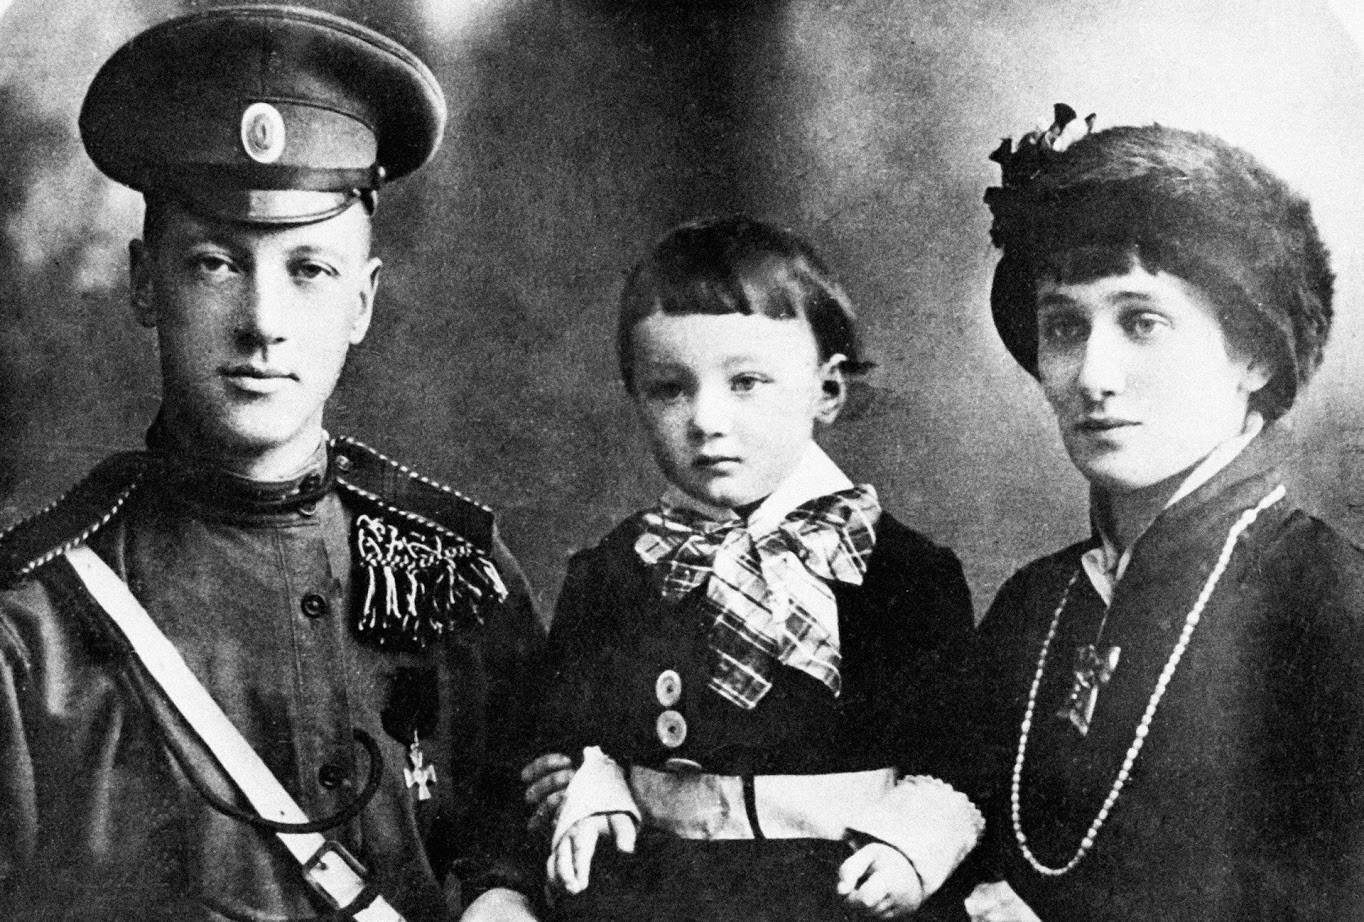 Pesnika Nikolaj Gumiljov (levo) in Anna Ahmatova (desno) s sinom Levom Gumiljovim.